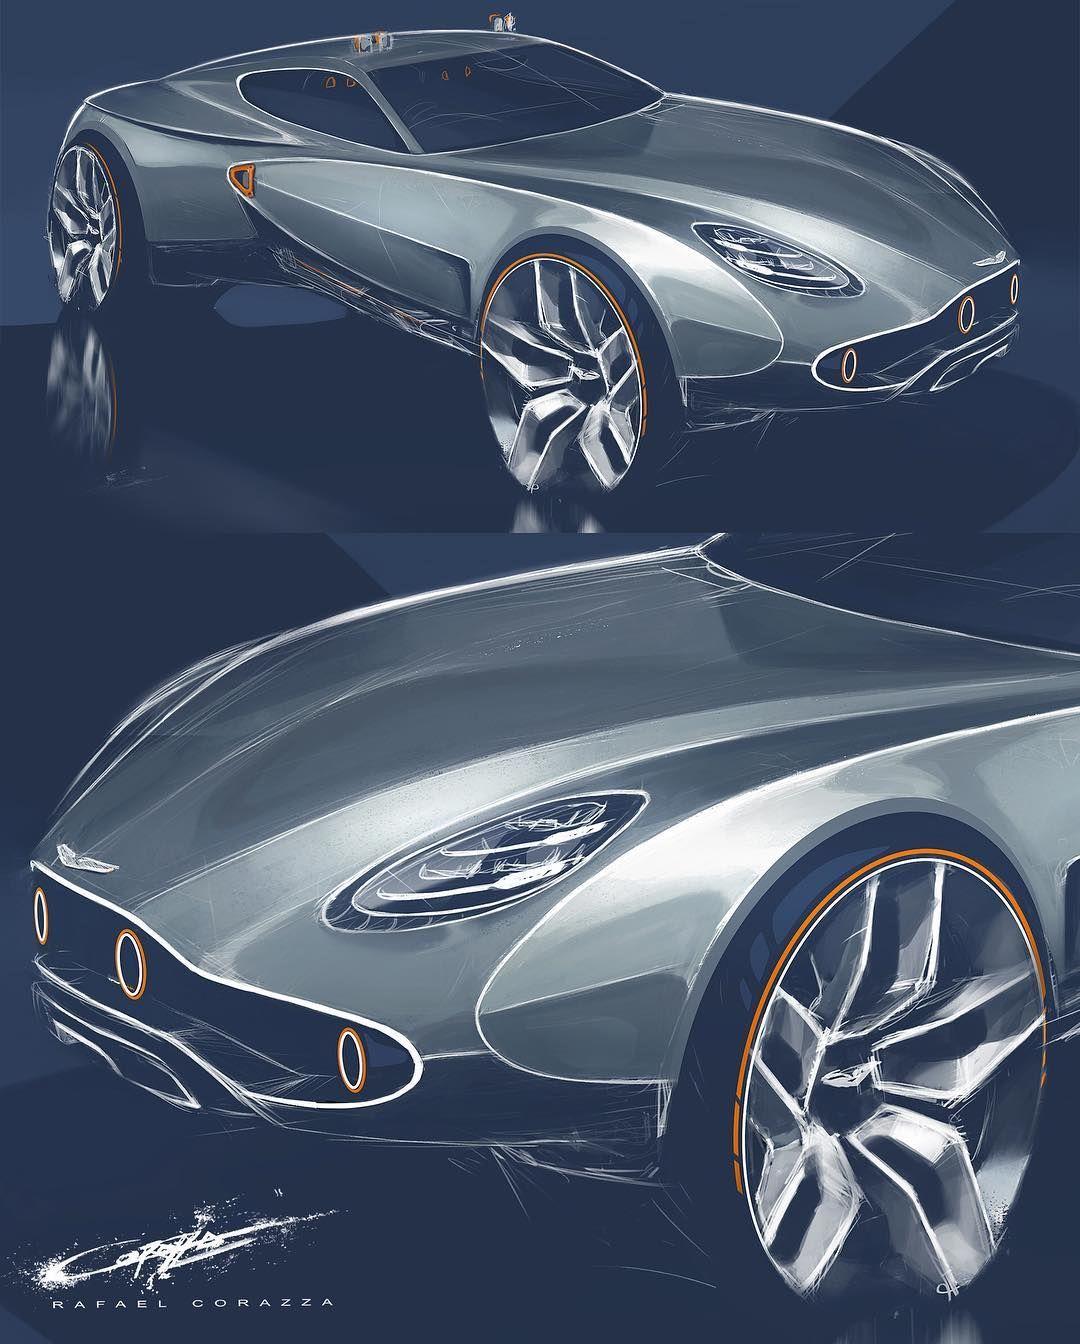 Aston Martin Sketch: Aston Martin Off-roader?? 🤪#AstonLove. . . #Astonmartin